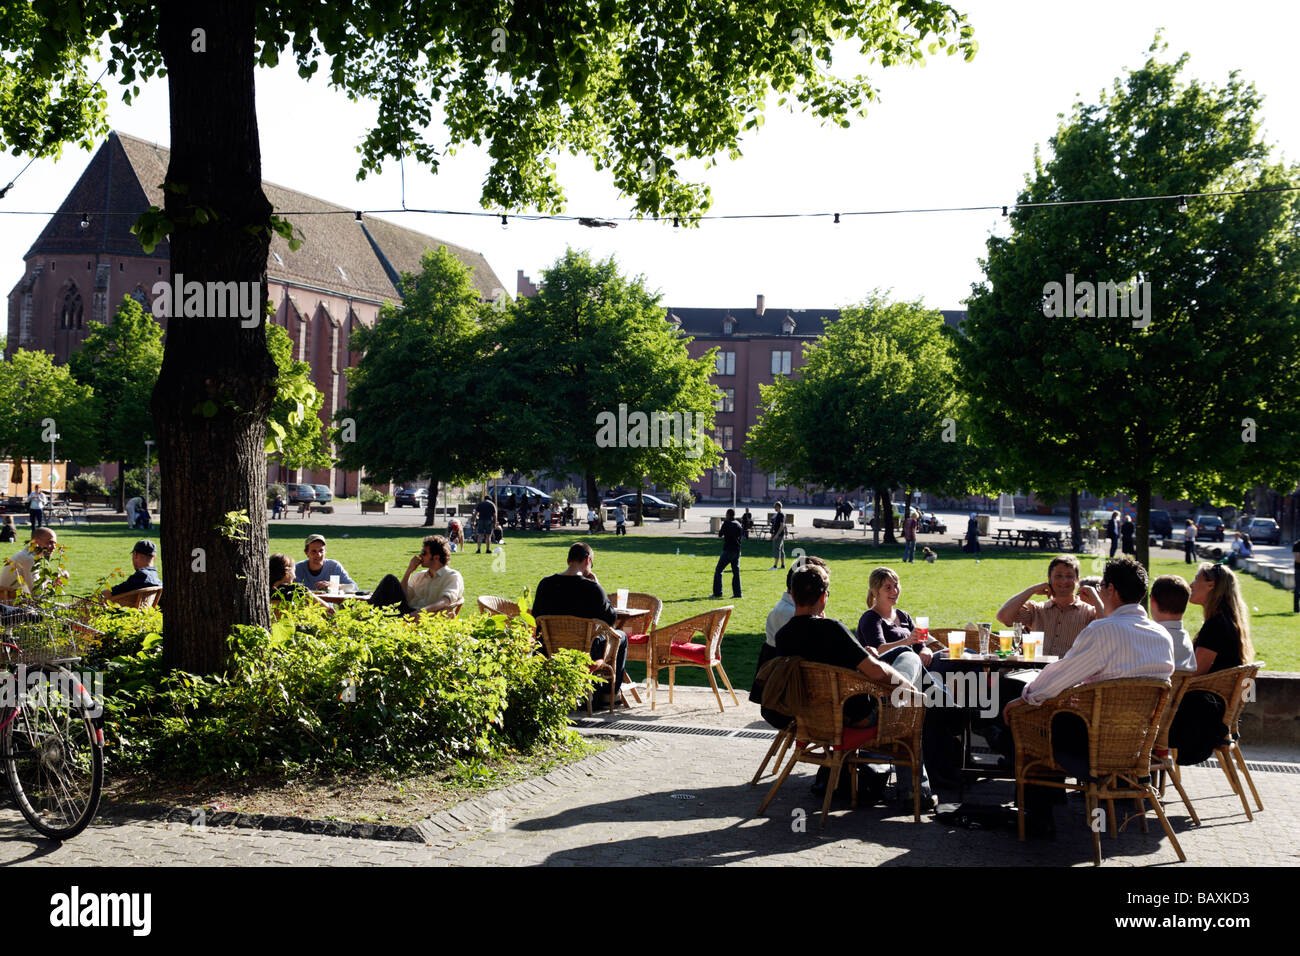 Leute sitzen in einem Café am Arts Centre, Kulturzentrum Kaserne, Basel, Schweiz Stockbild